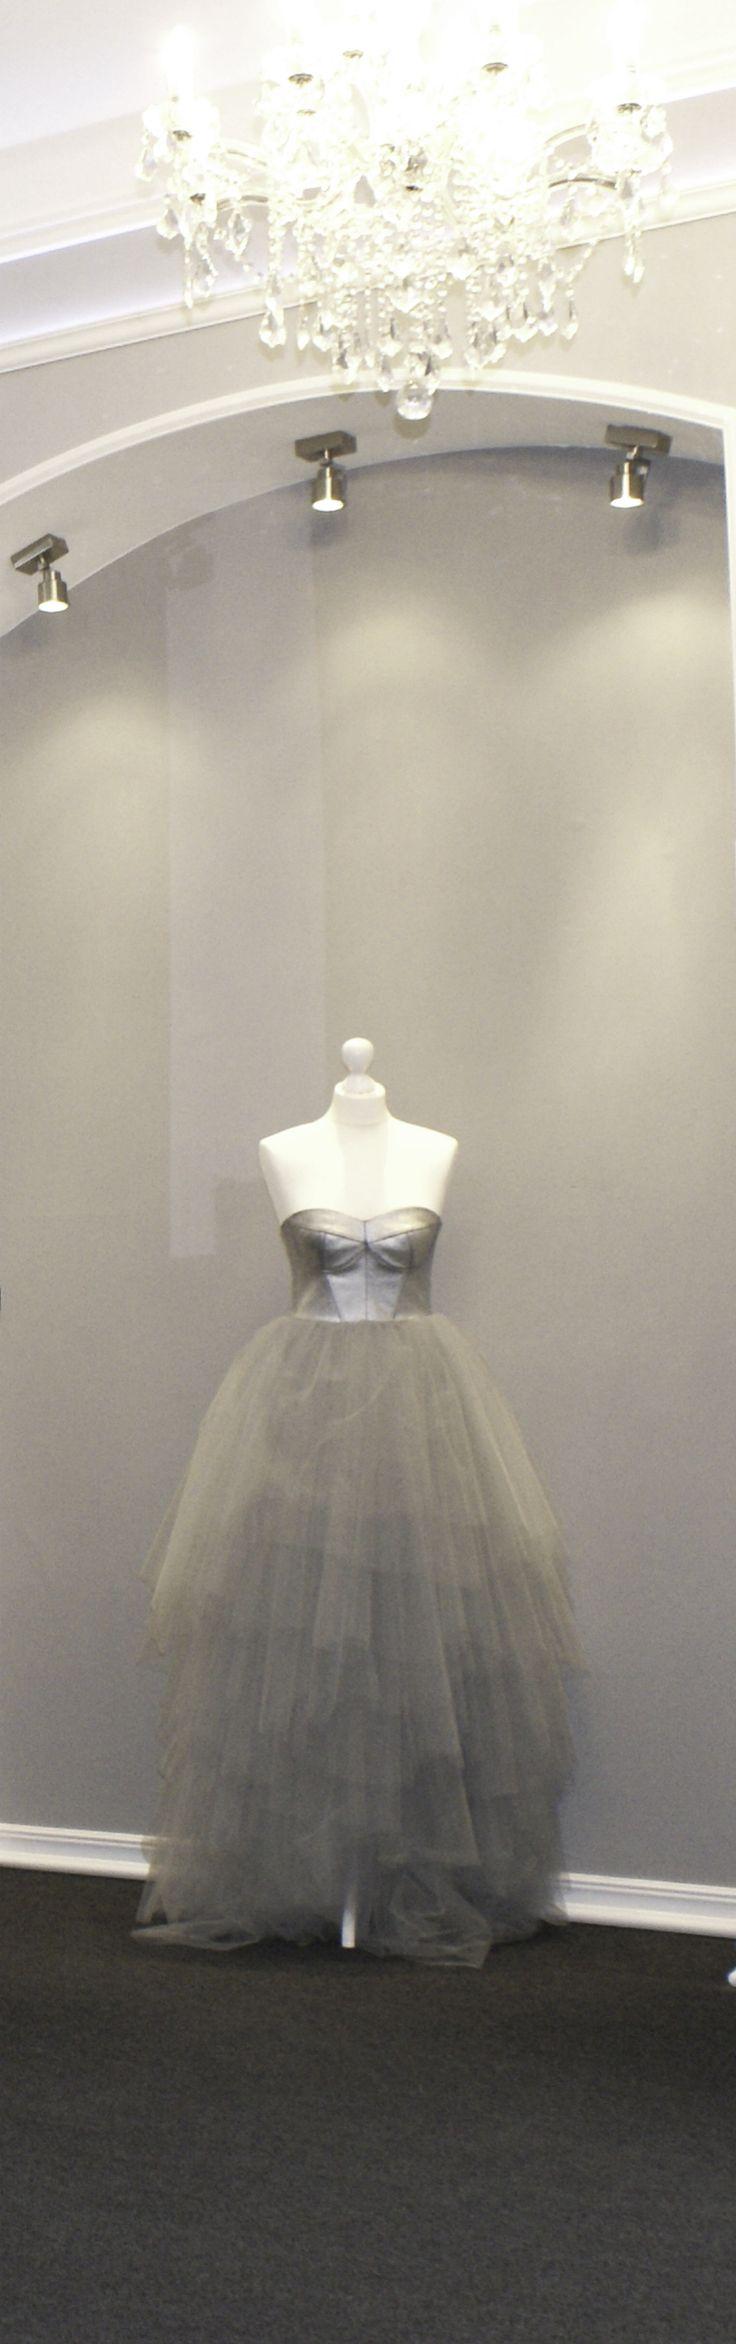 #open #store #atelier #fashion #cute #people #sądowa2 #lublin #poland #collection #women #business #dress